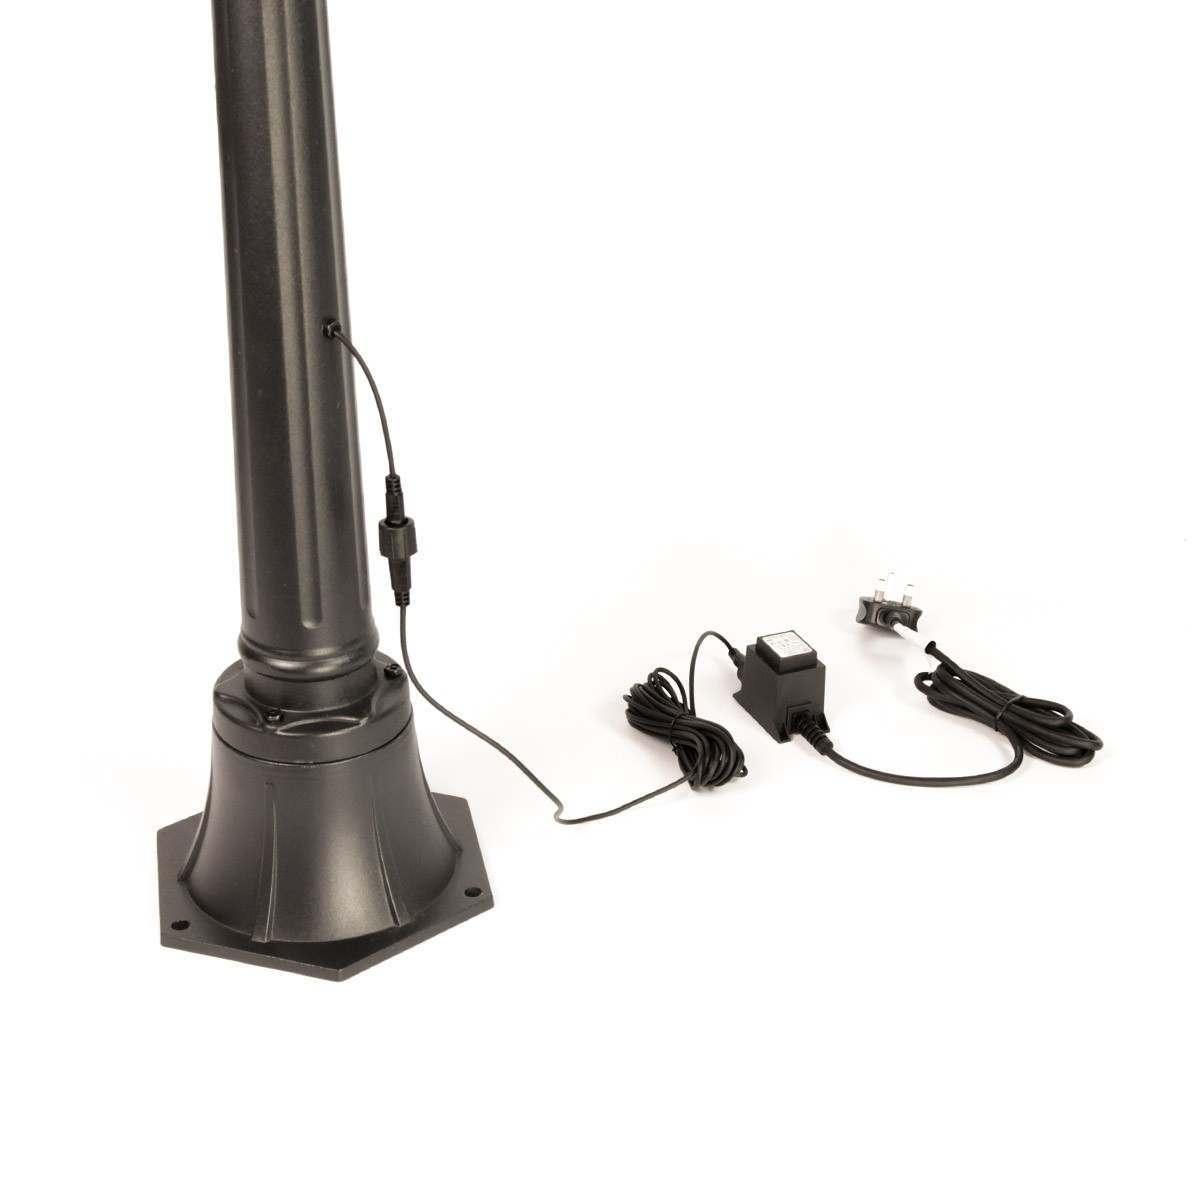 for outdoor low voltage power transformer for super solar lamp posts. Black Bedroom Furniture Sets. Home Design Ideas